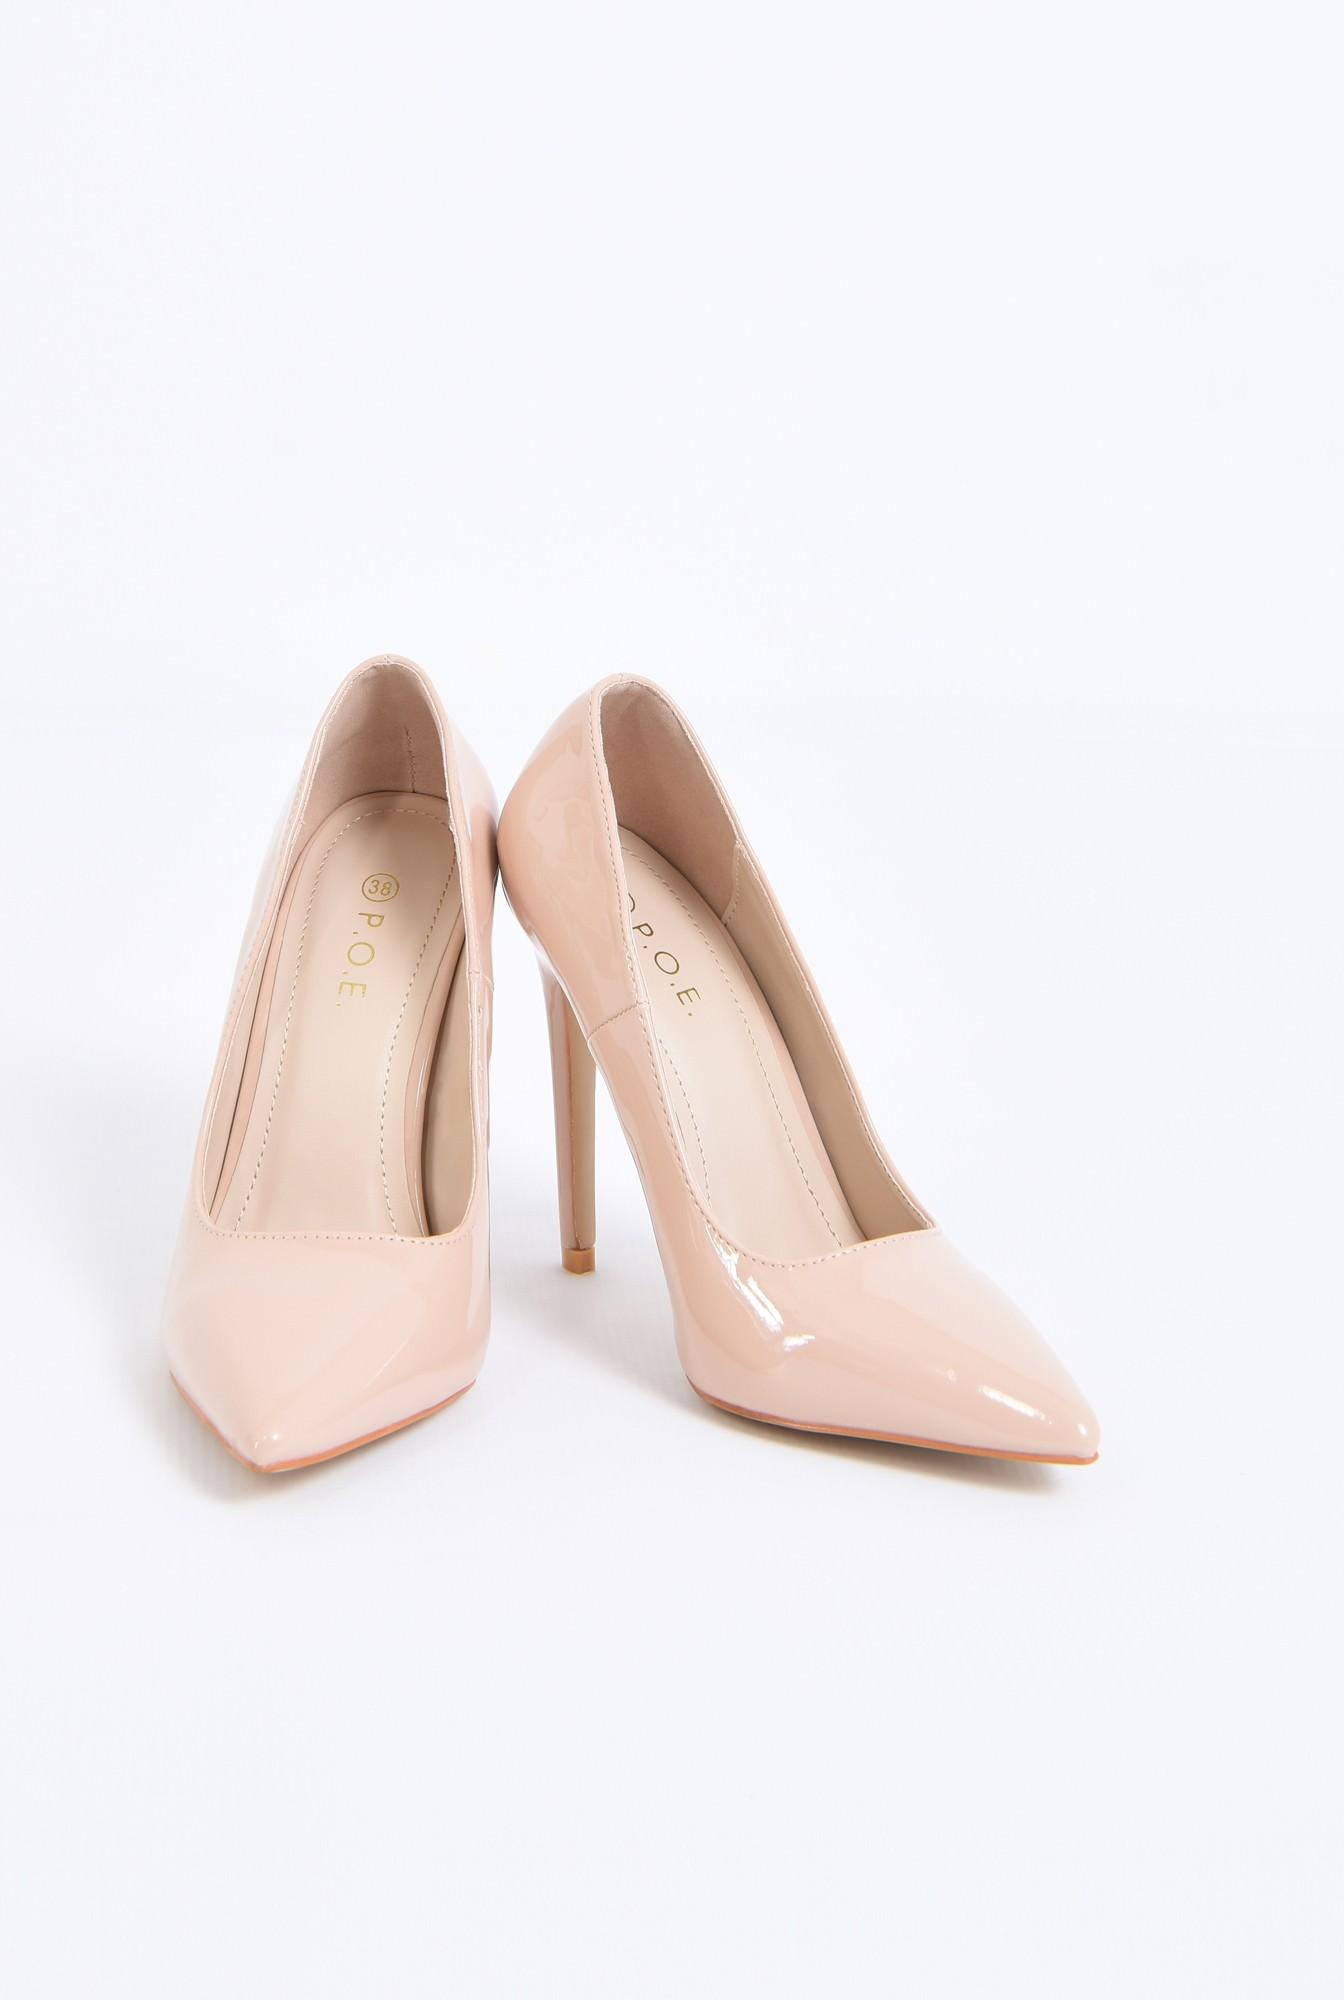 3 - pantofi eleganti, crem, toc inalt, varf ascutit